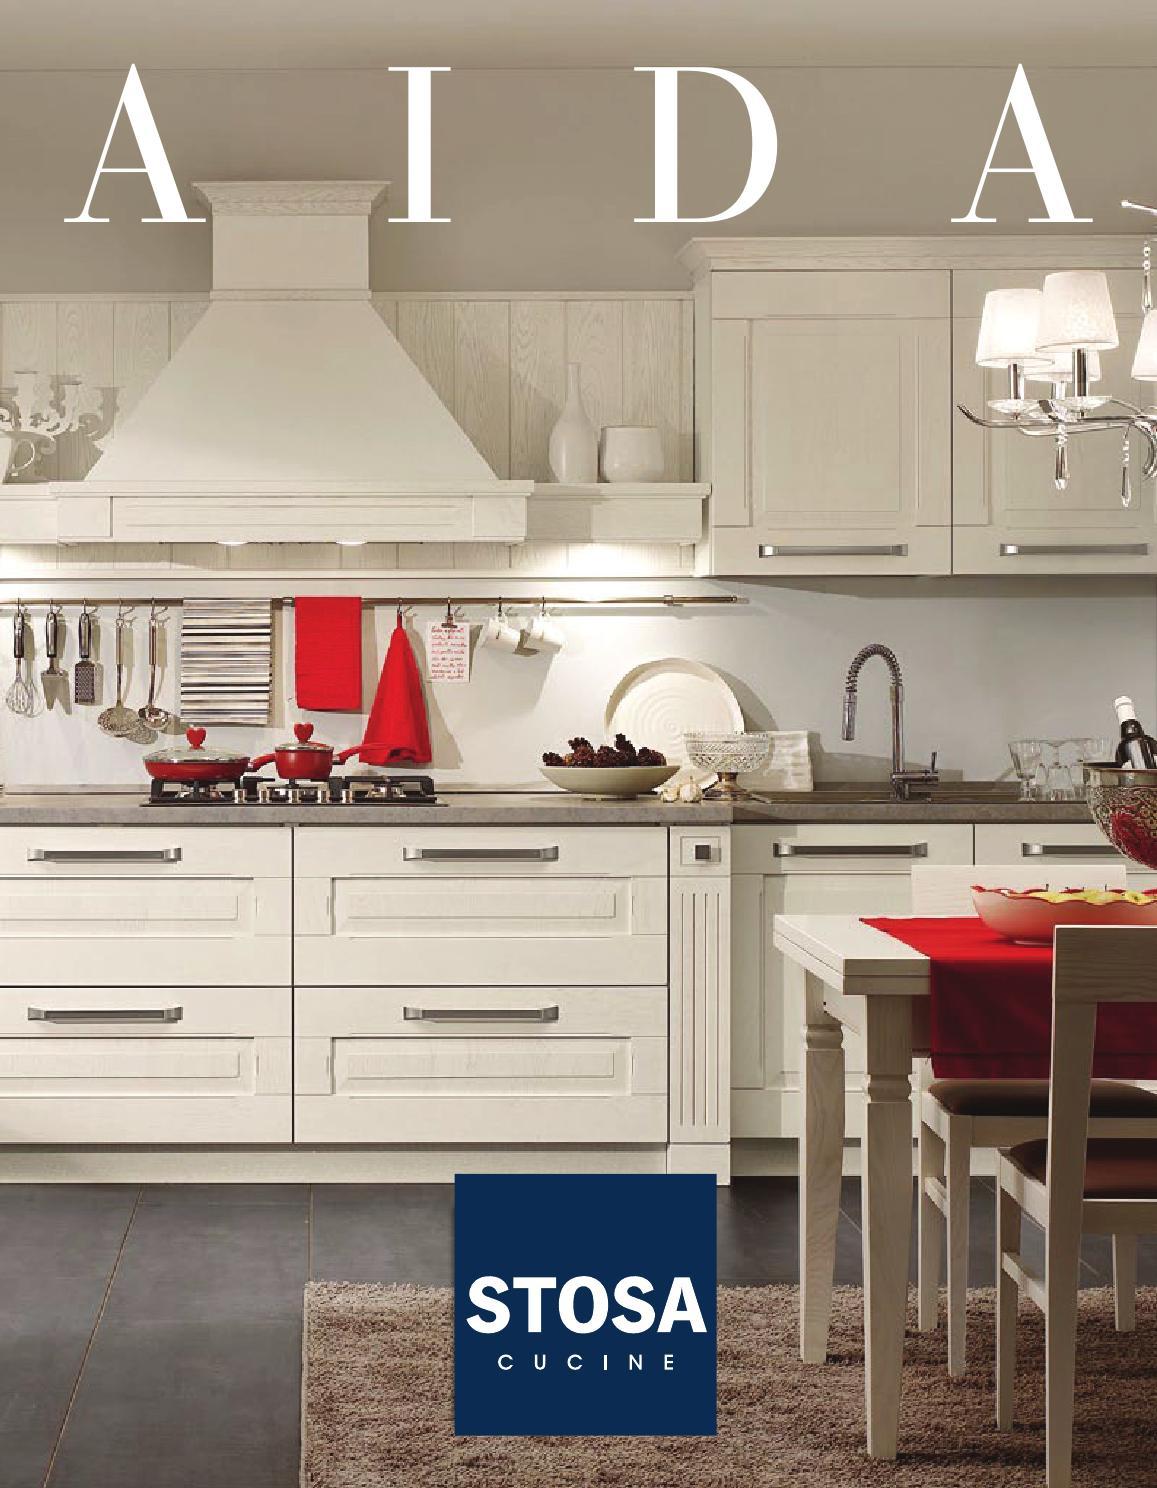 catalogo cucine classiche stosa aida by stosa cucine issuu